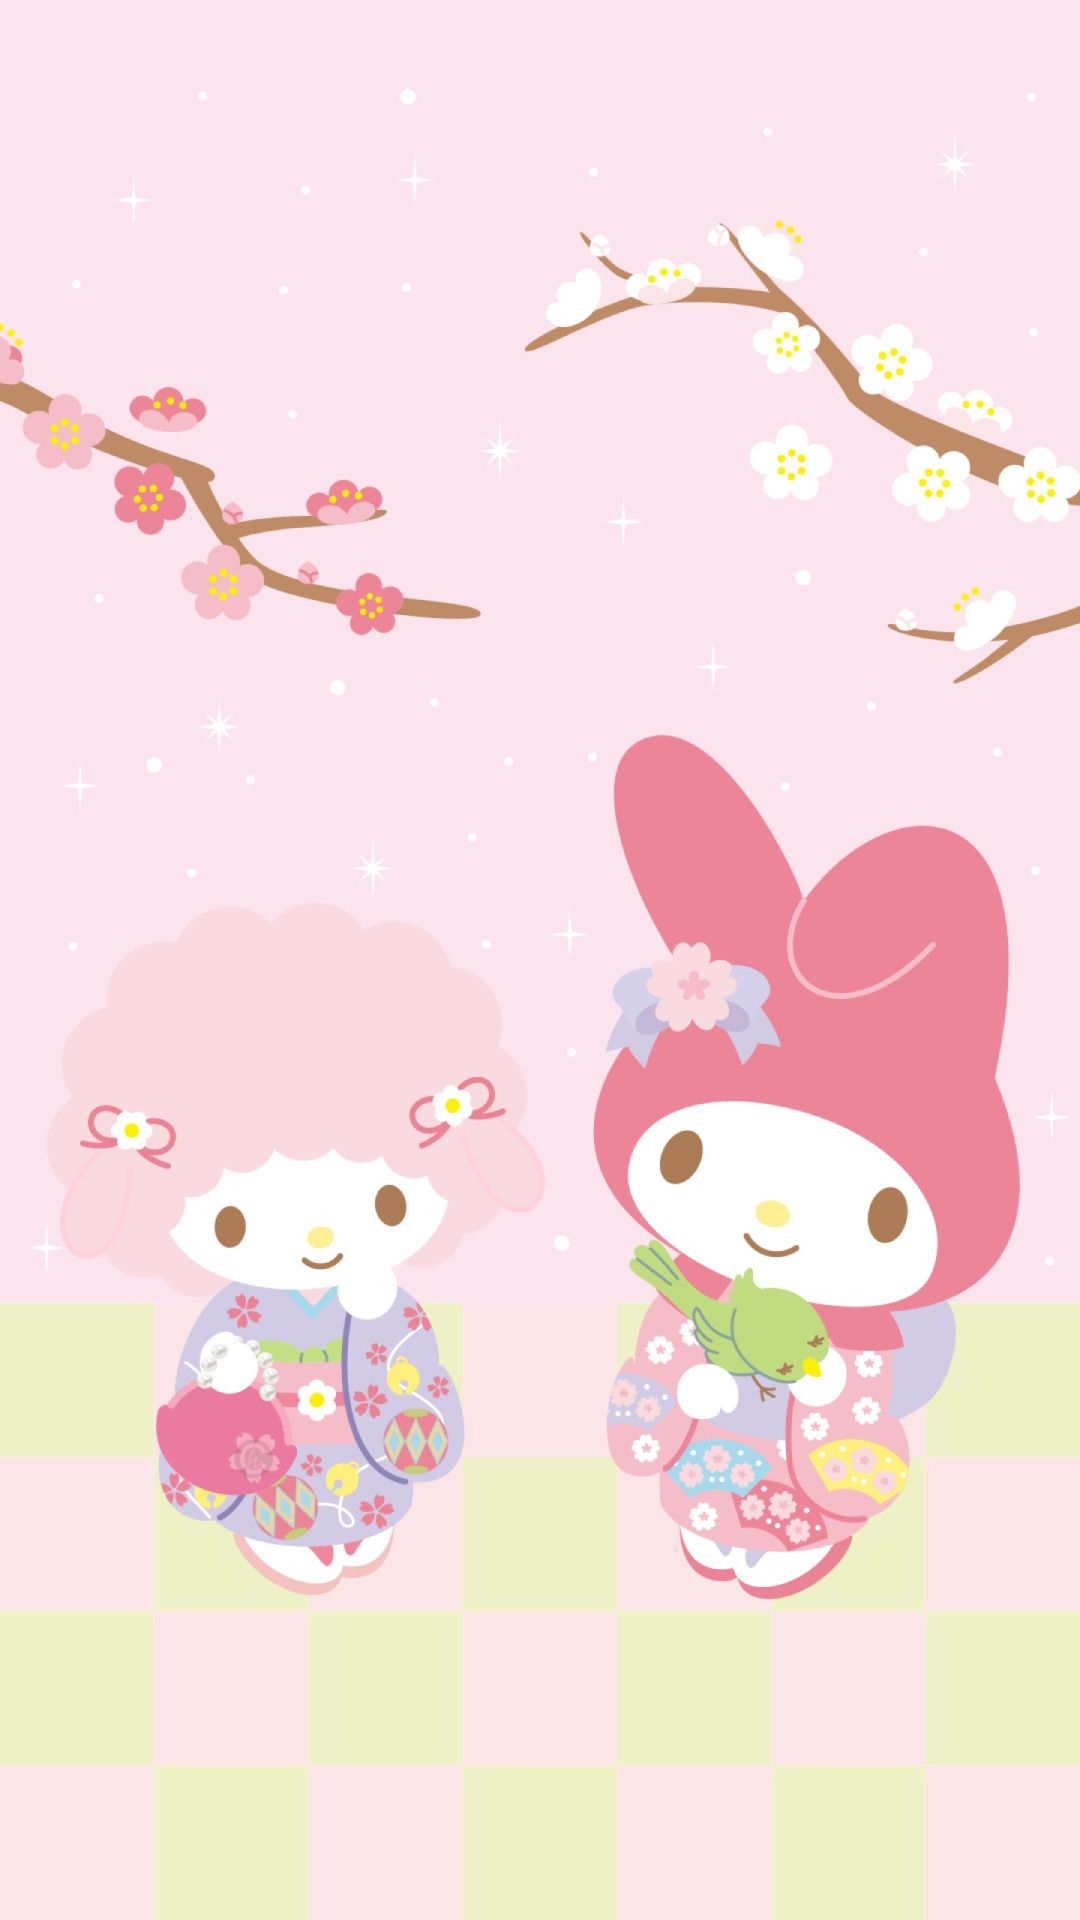 Sanrio Tumblr My Melody Wallpaper Sanrio Wallpaper Hello